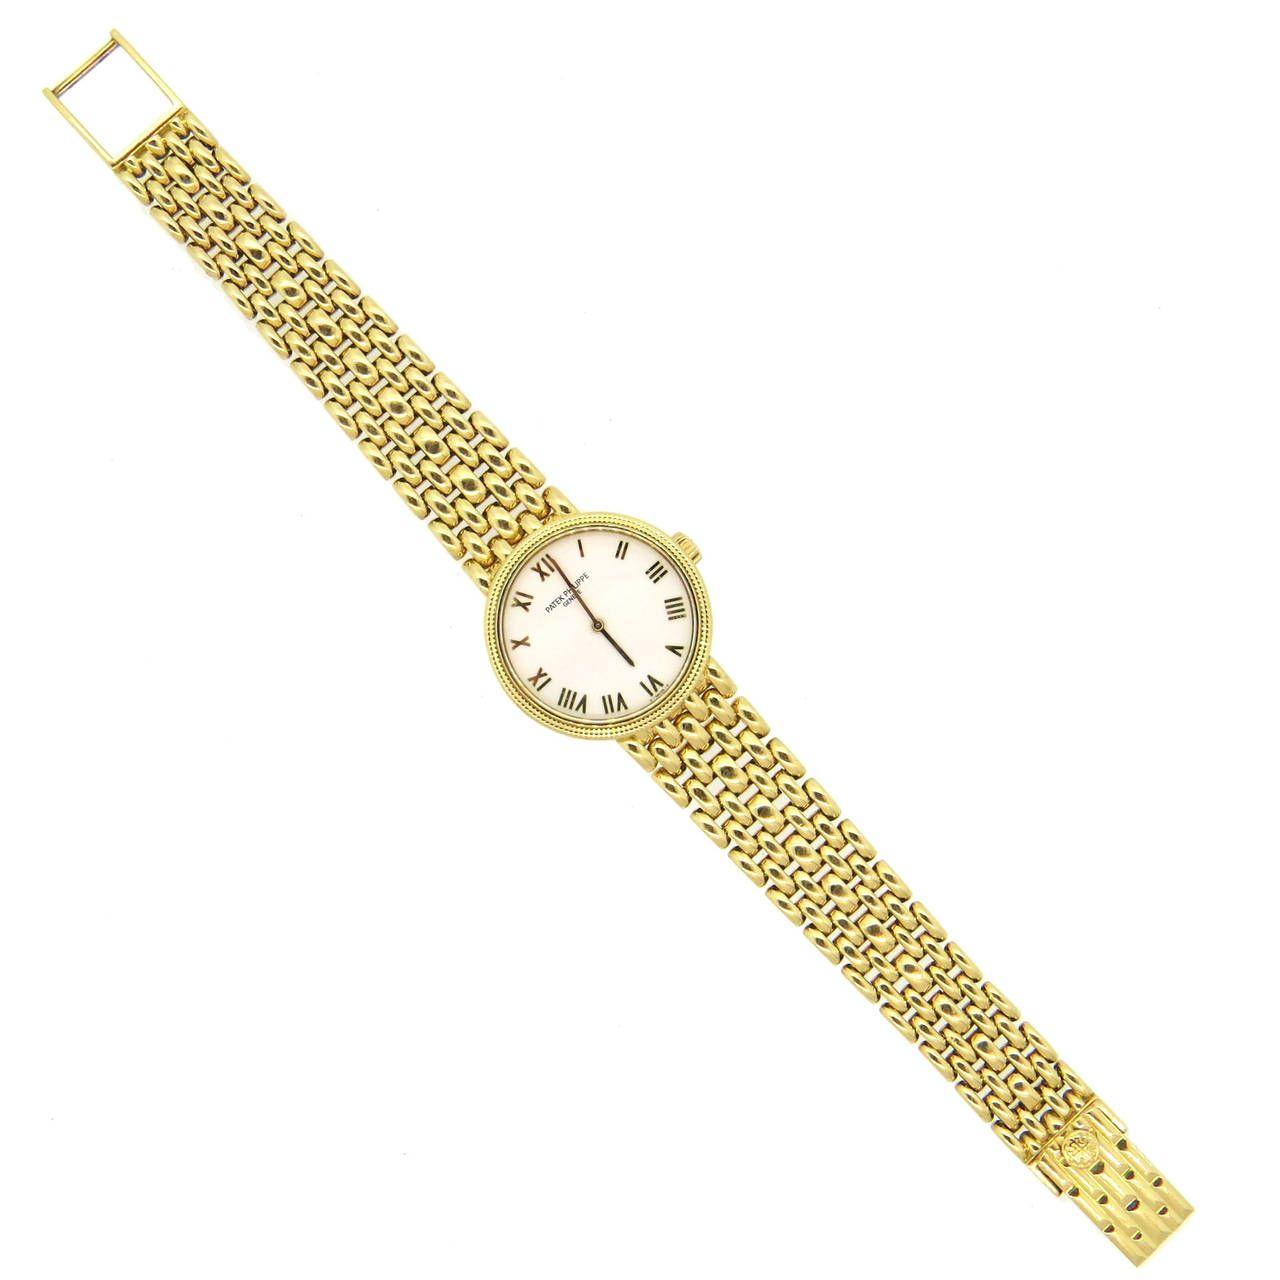 Patek philippe ladyus yellow gold calatrava wristwatch from a